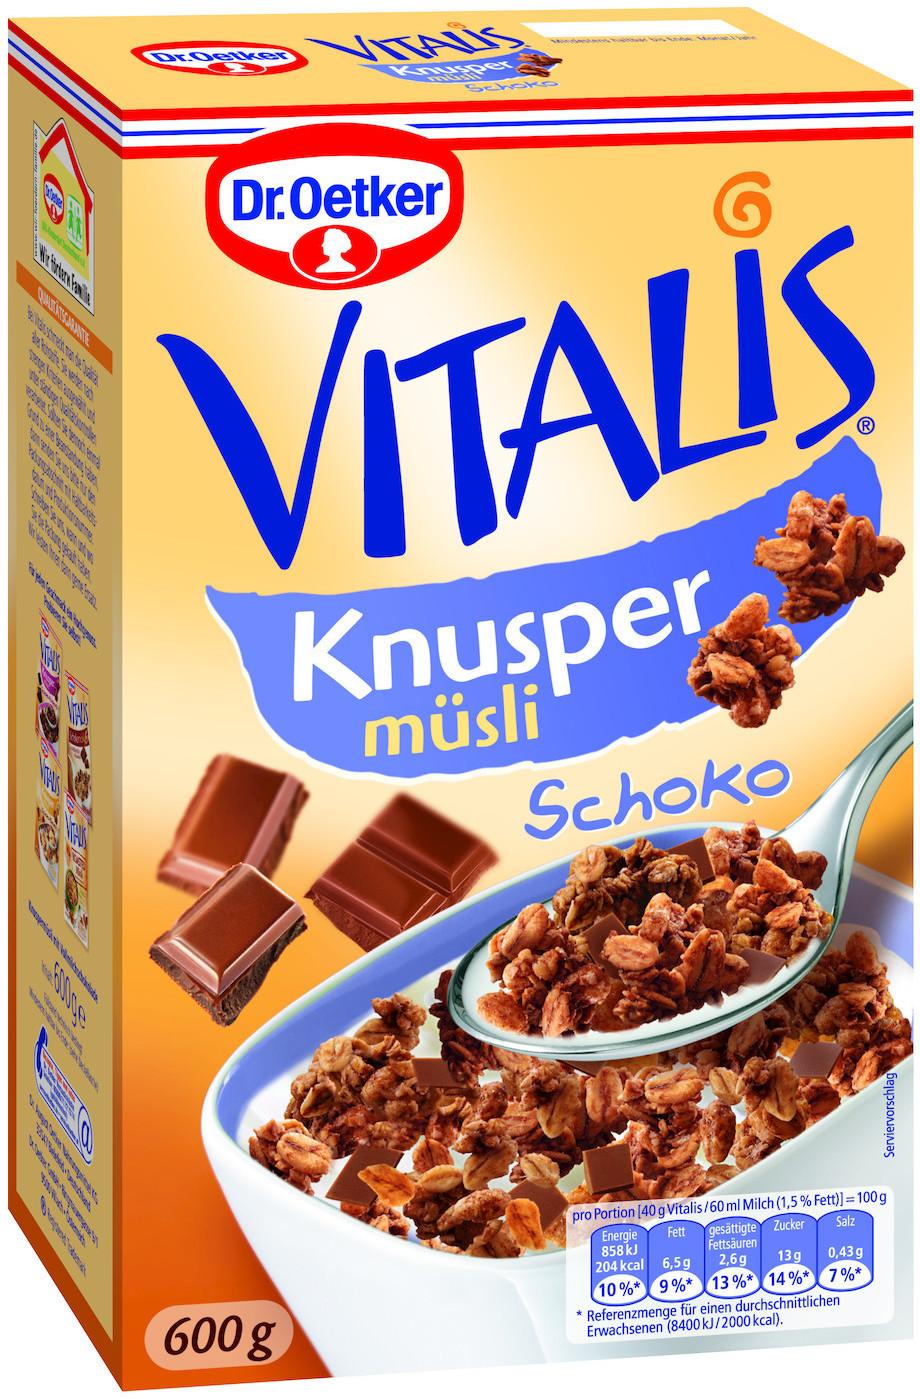 Dr. Oetker Vitalis Knusper Schoko (600 g)